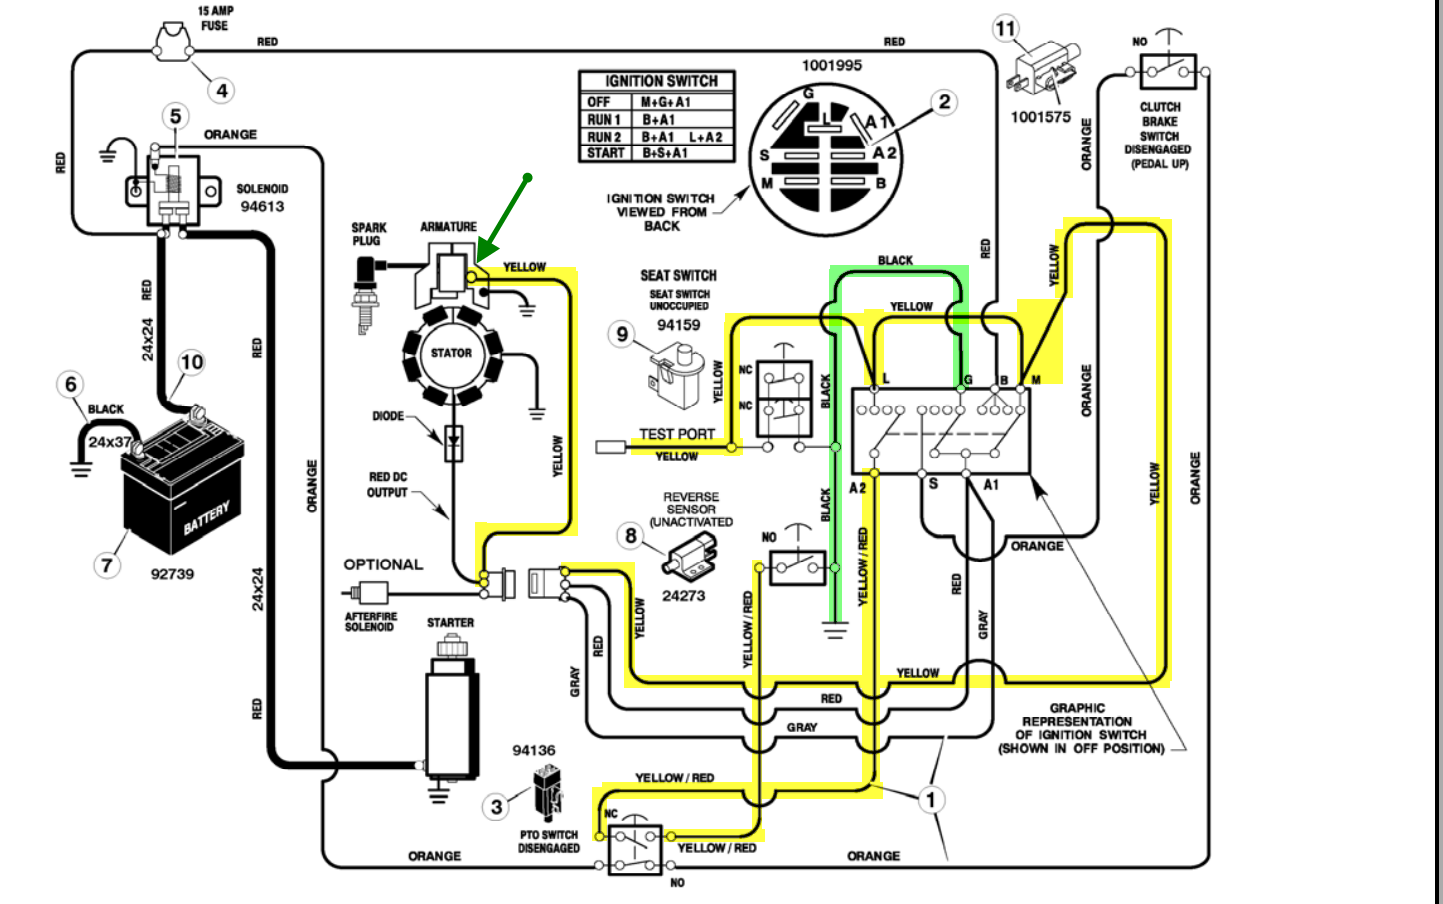 19 hp briggs and stratton wiring diagram diagrams schematics best of [ 1443 x 904 Pixel ]